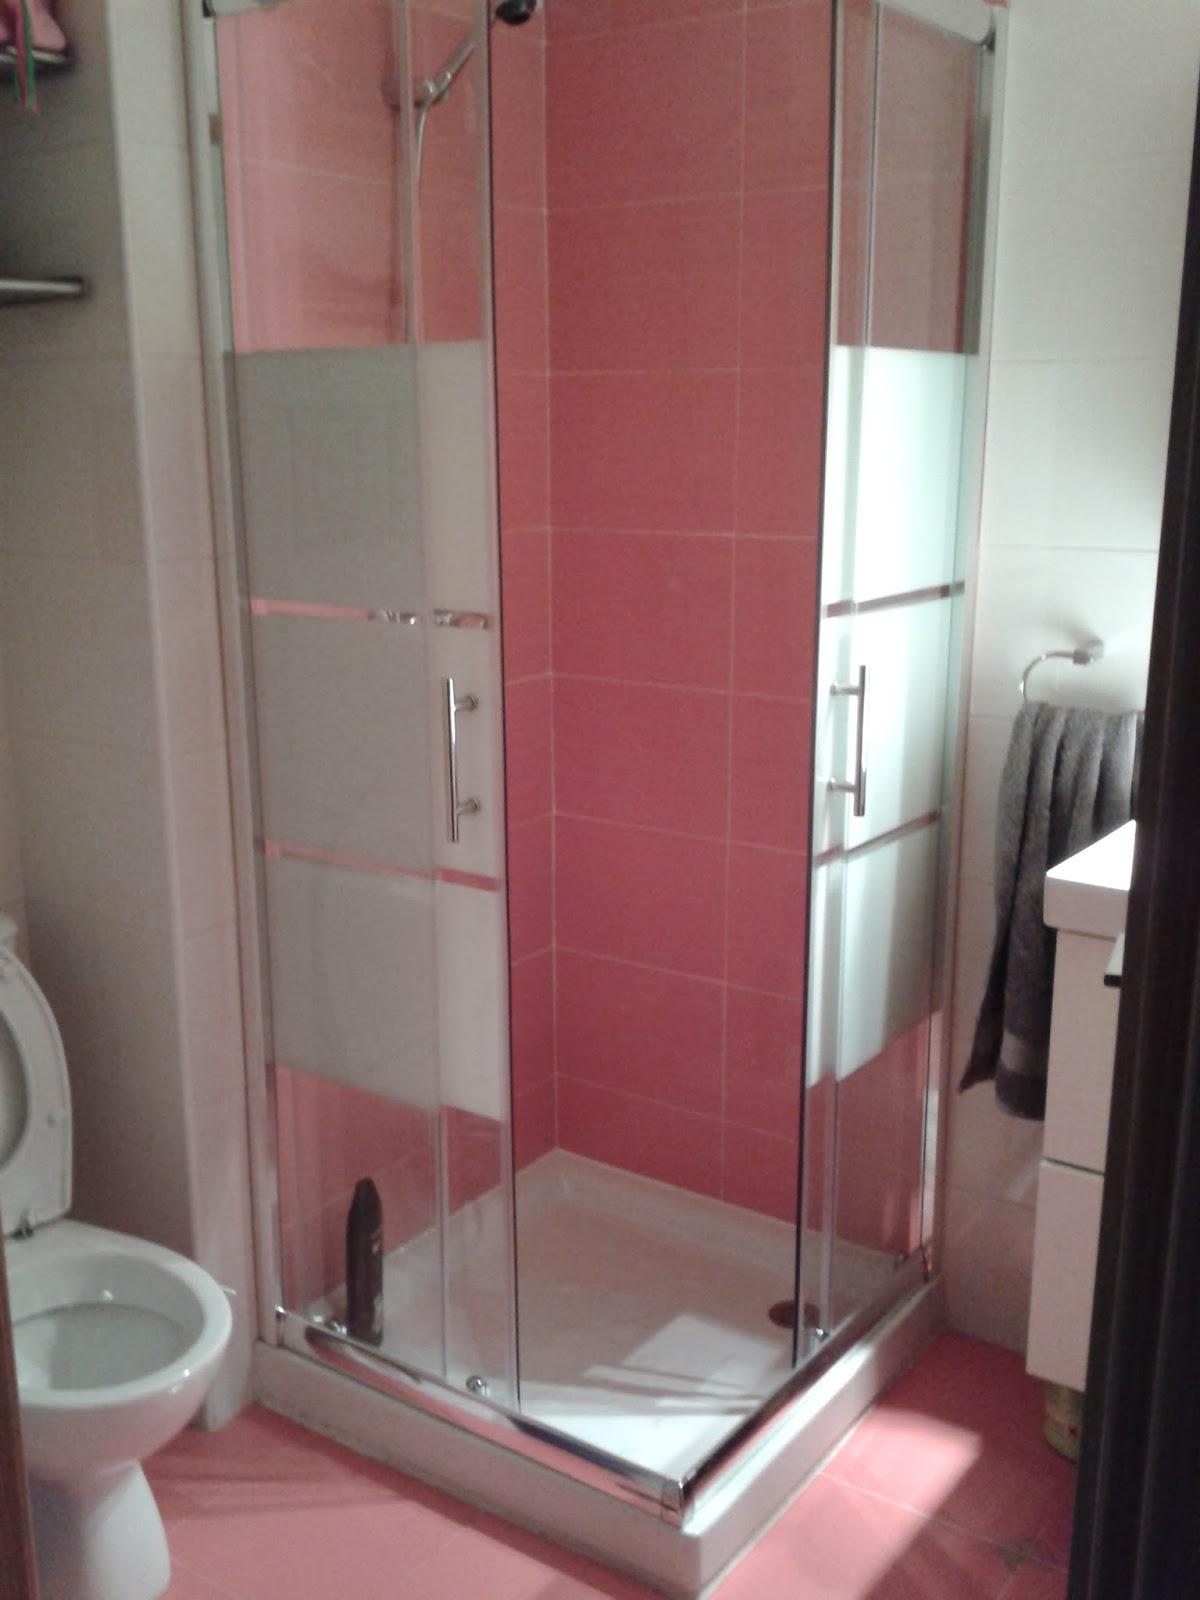 Azulejos para un cuarto de ba o pequeno - Papel para azulejos de bano ...